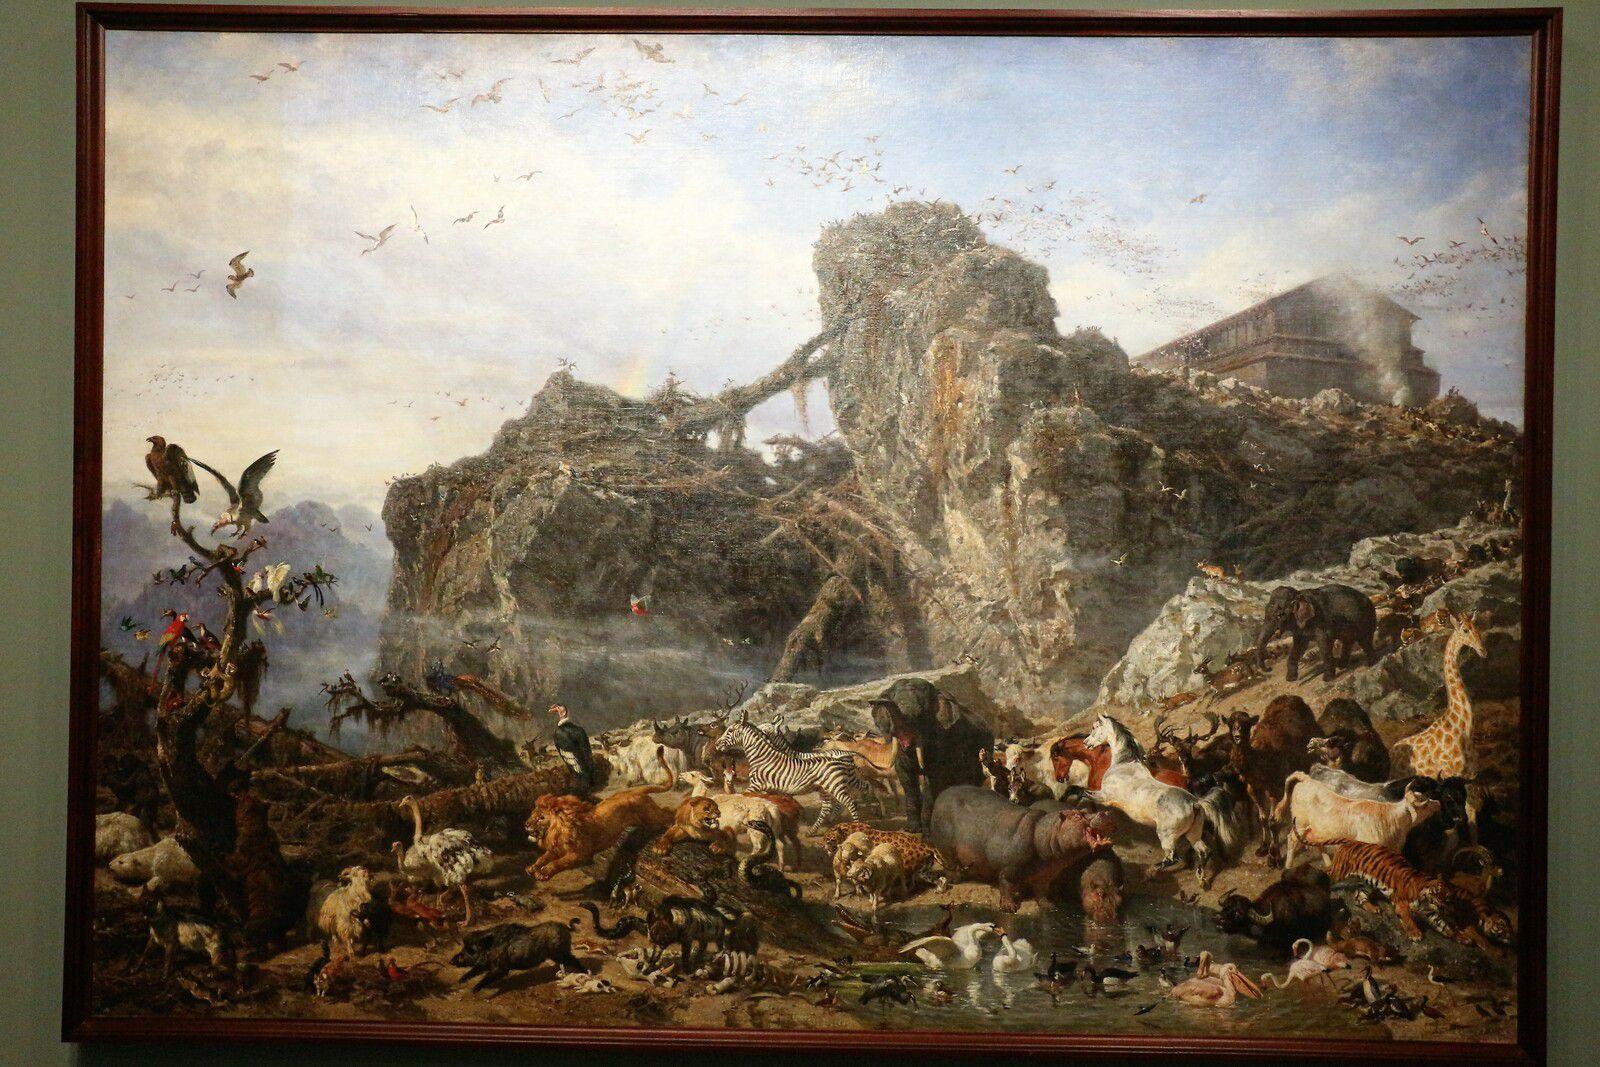 Les origines du monde - l'invention de la nature au XIXe siècle (I/II)